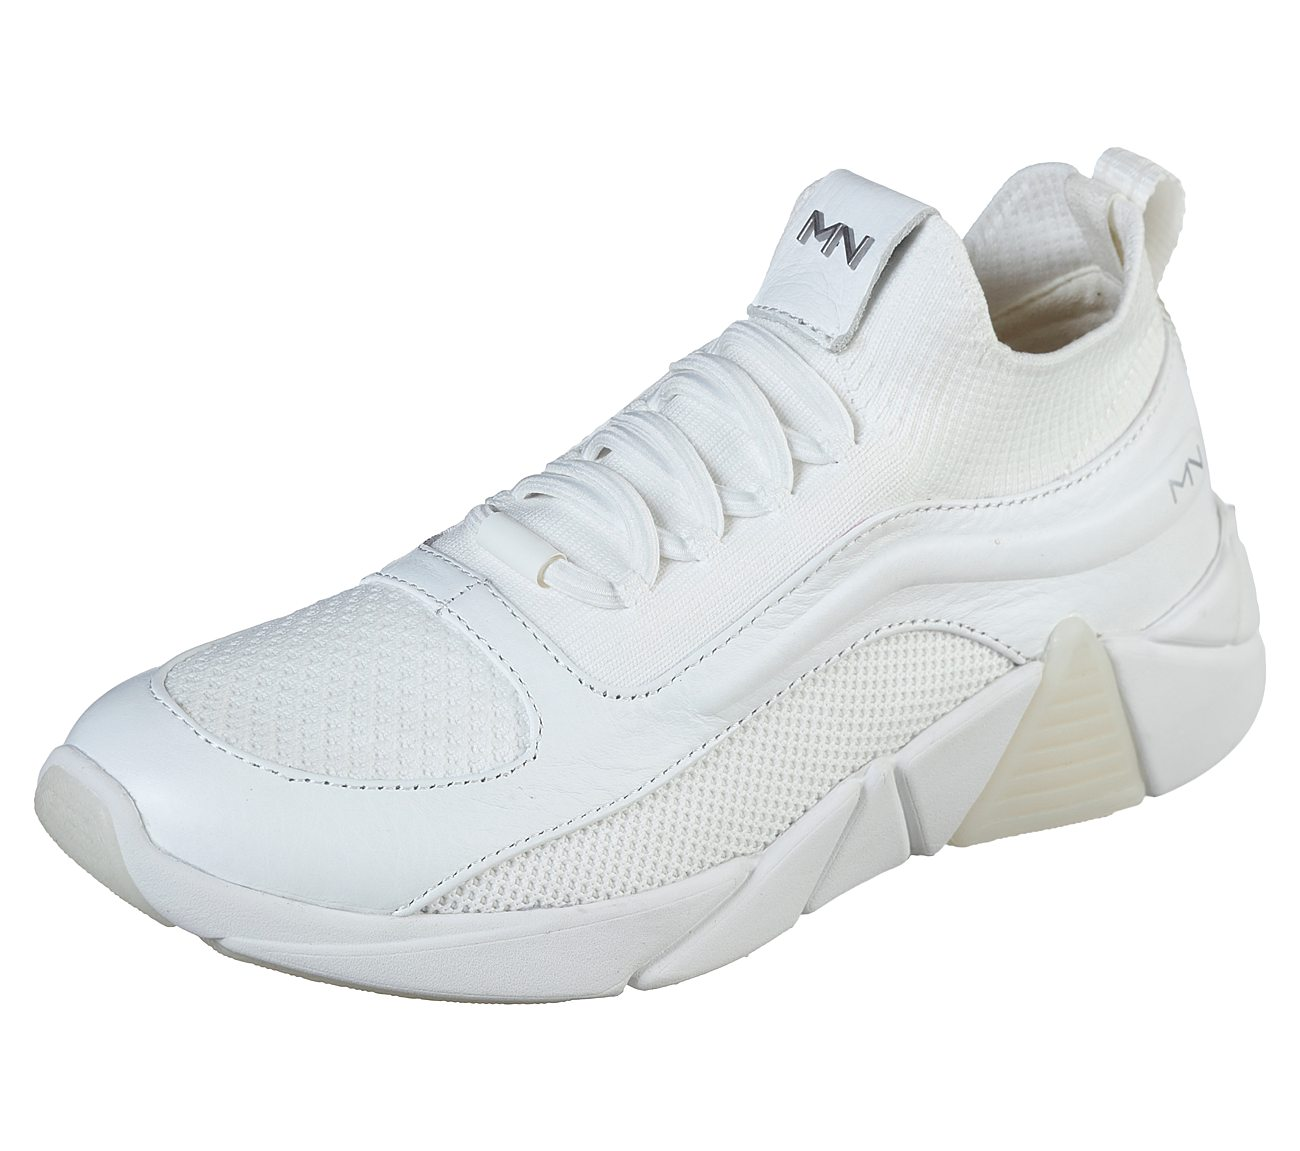 SKECHERS A-Line - Roads Mark Nason Shoes